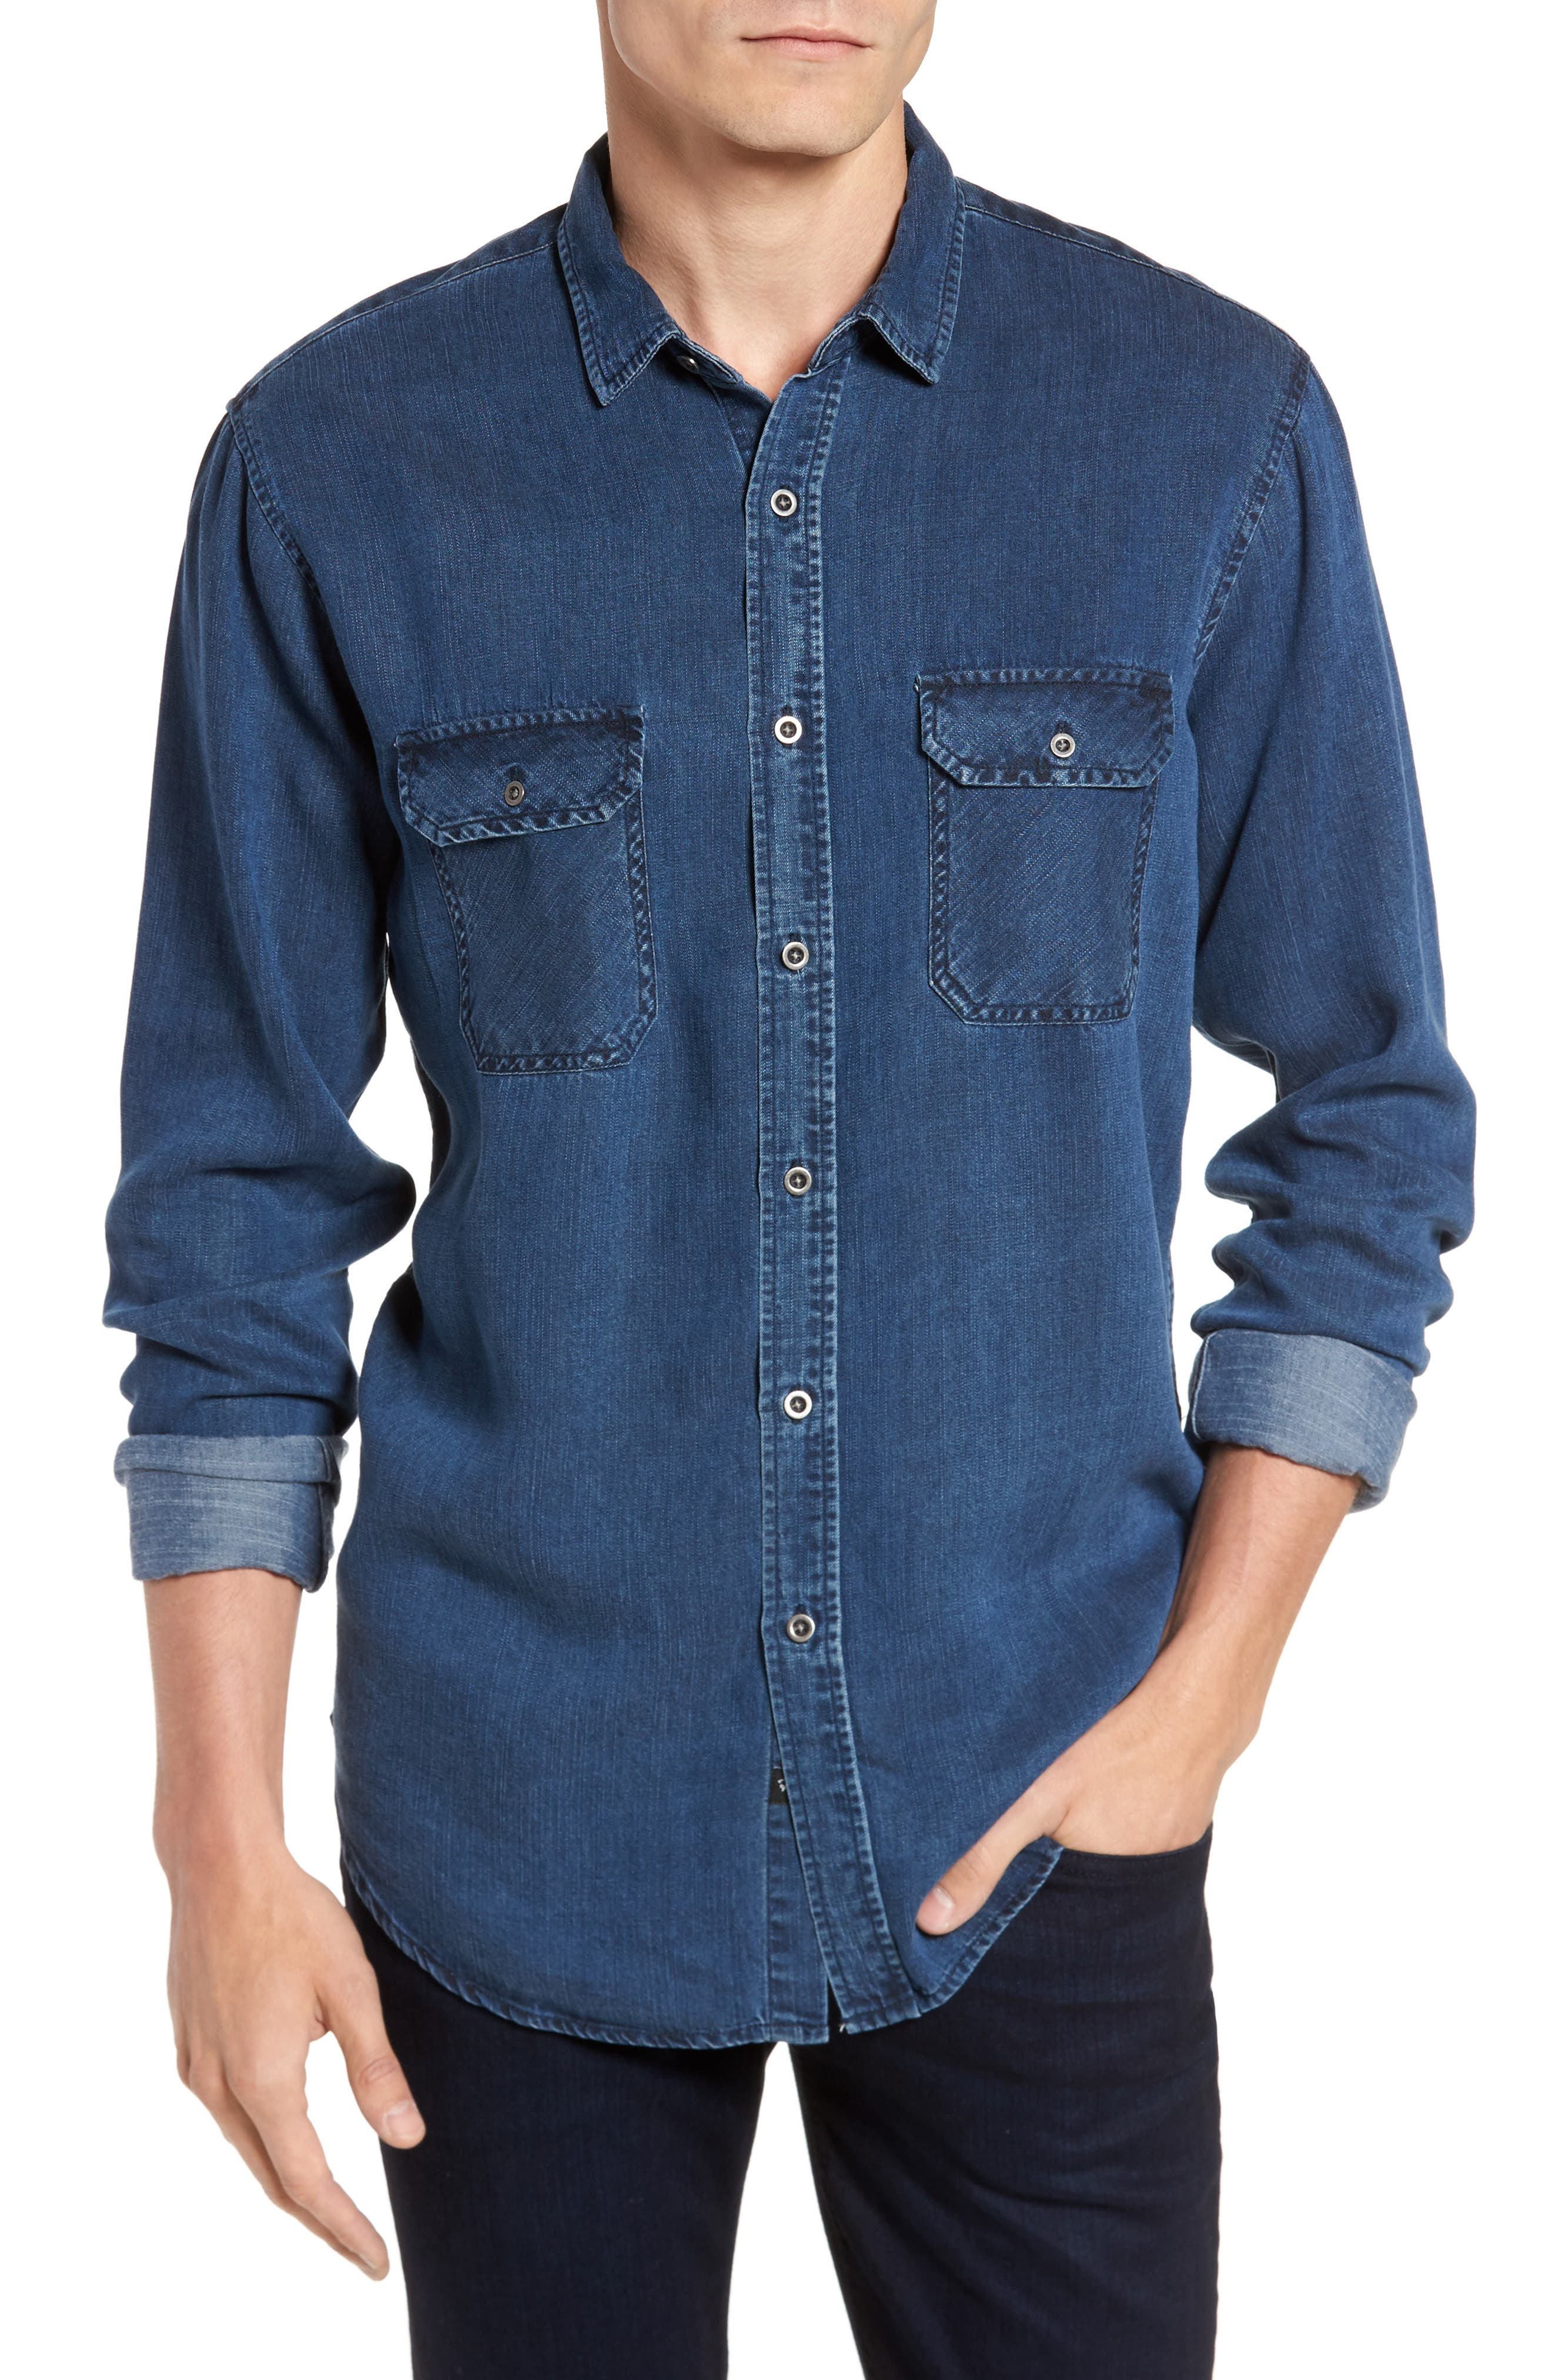 Beckford Denim Sport Shirt,                         Main,                         color, Midnight Vintage